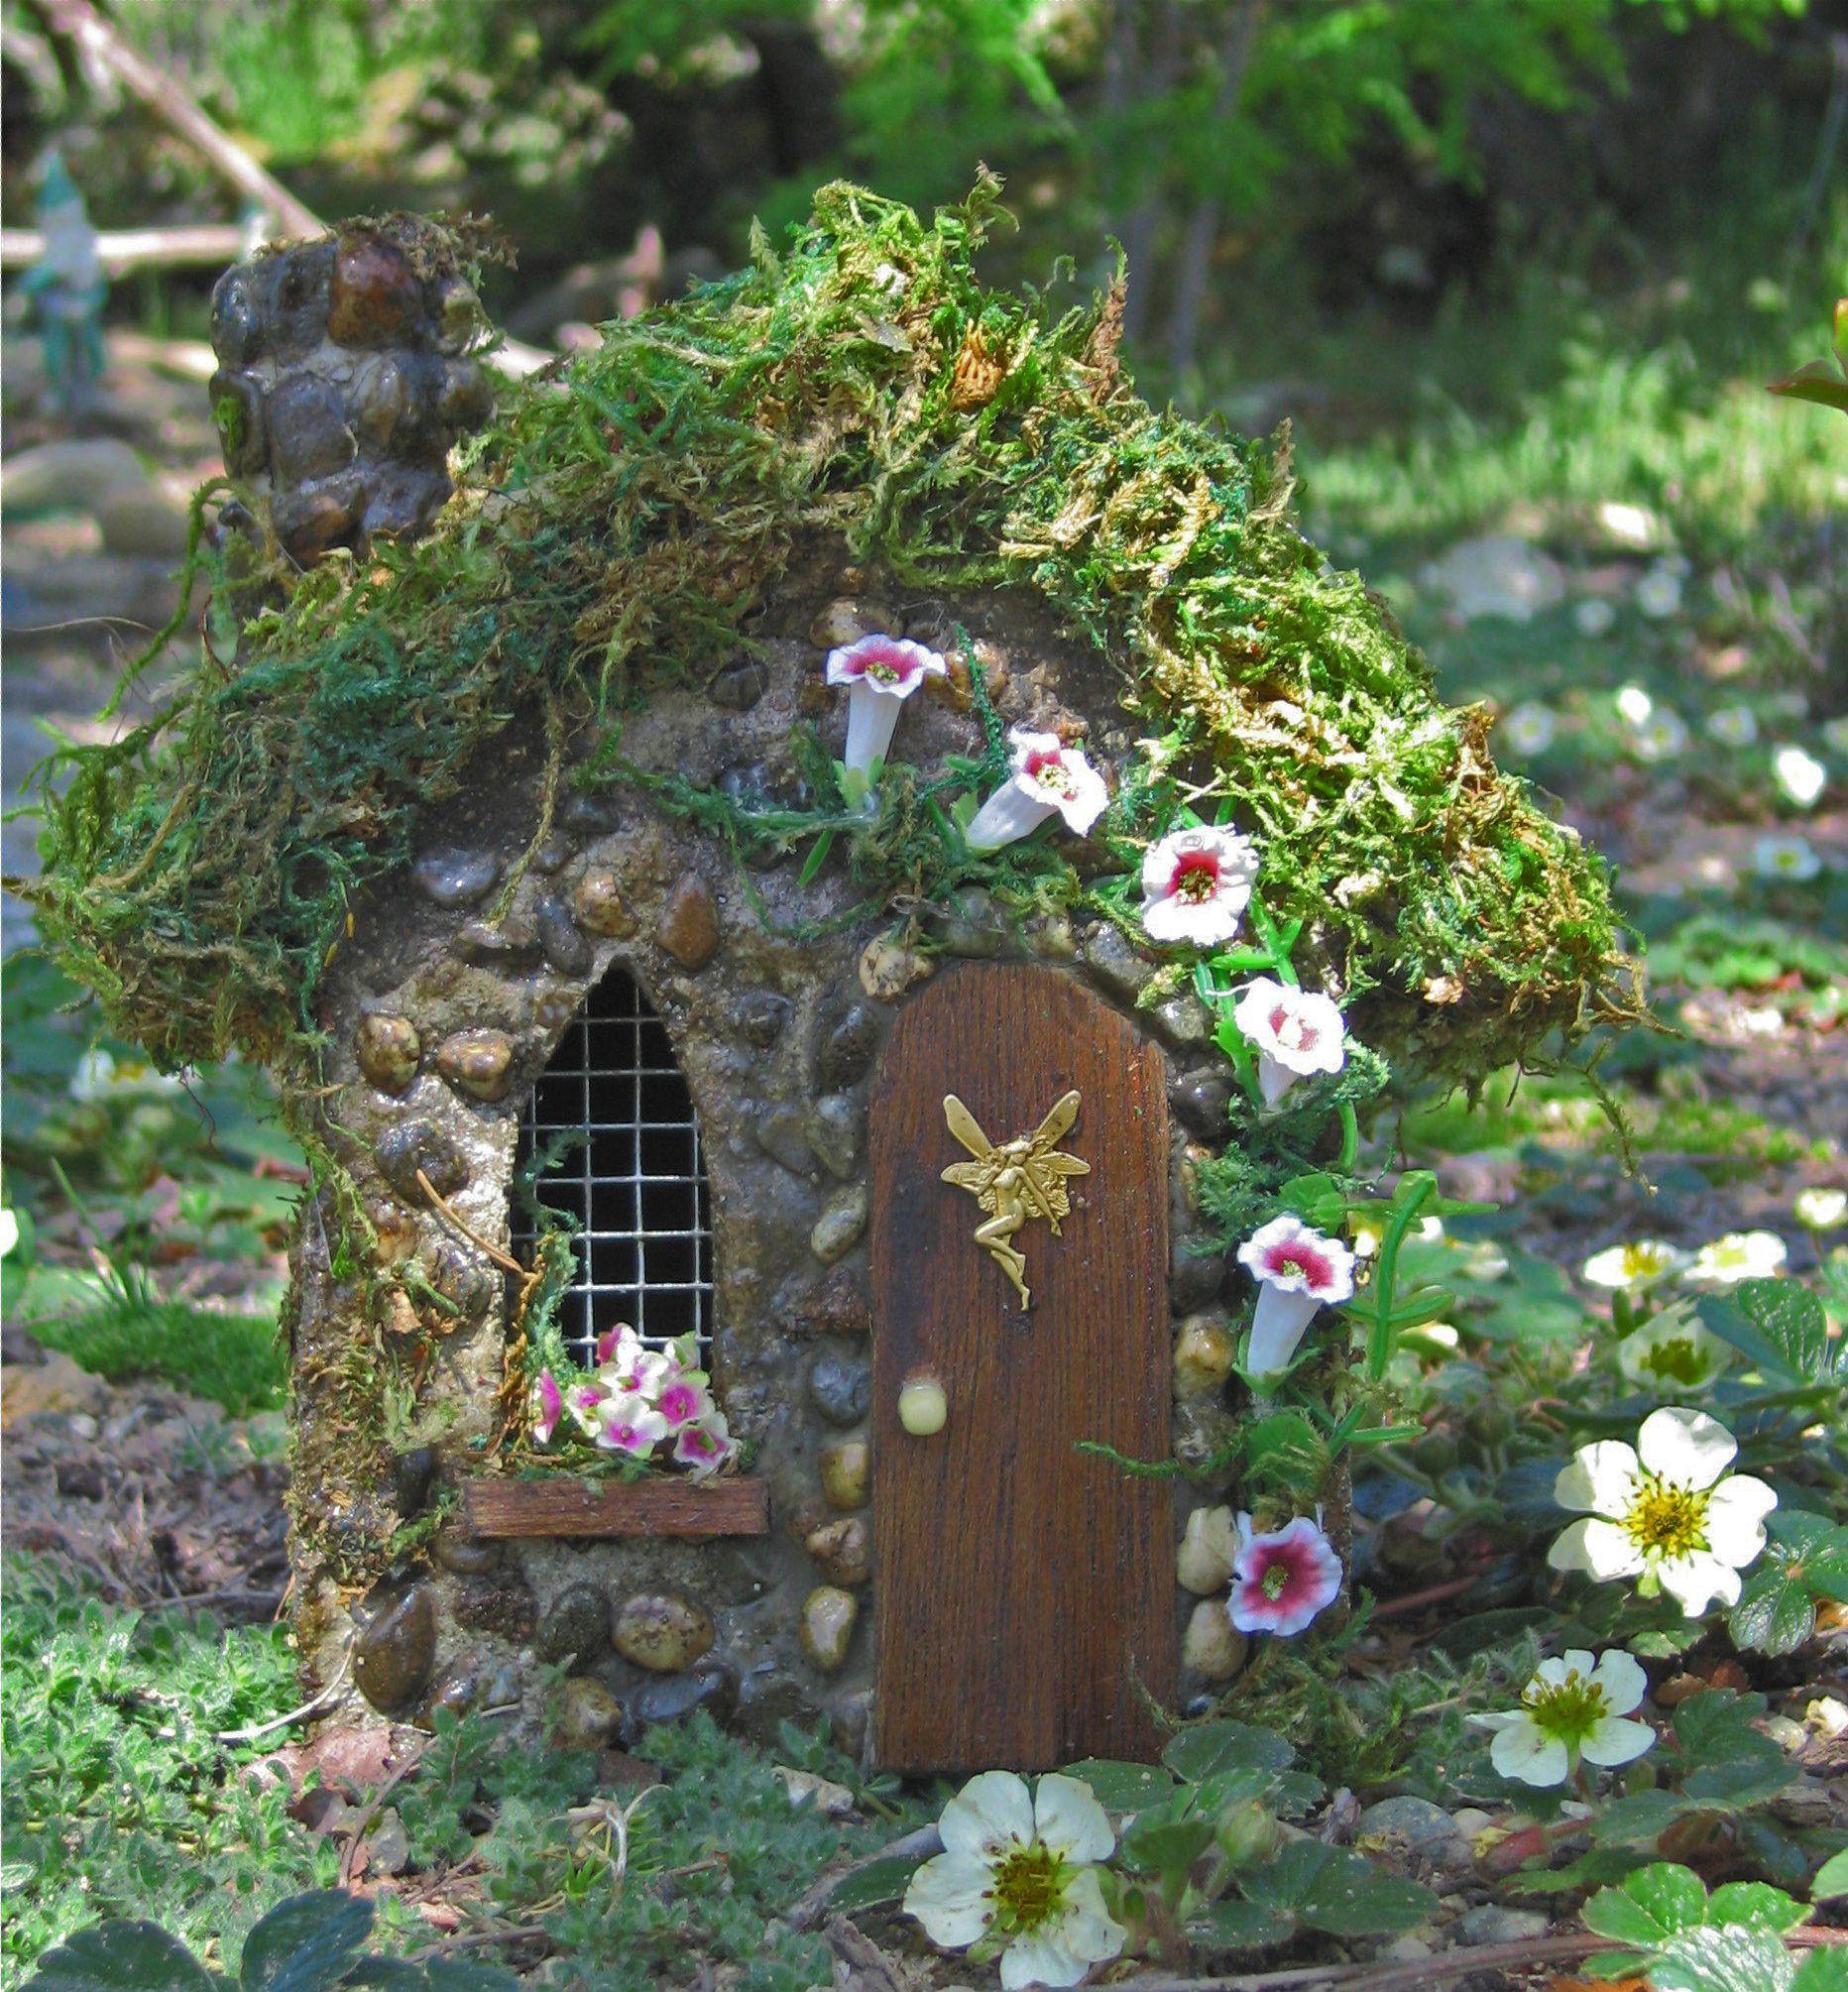 The 50 Best Diy Miniature Fairy Garden Ideas In 2019: Granddaughter Fairy Garden Day